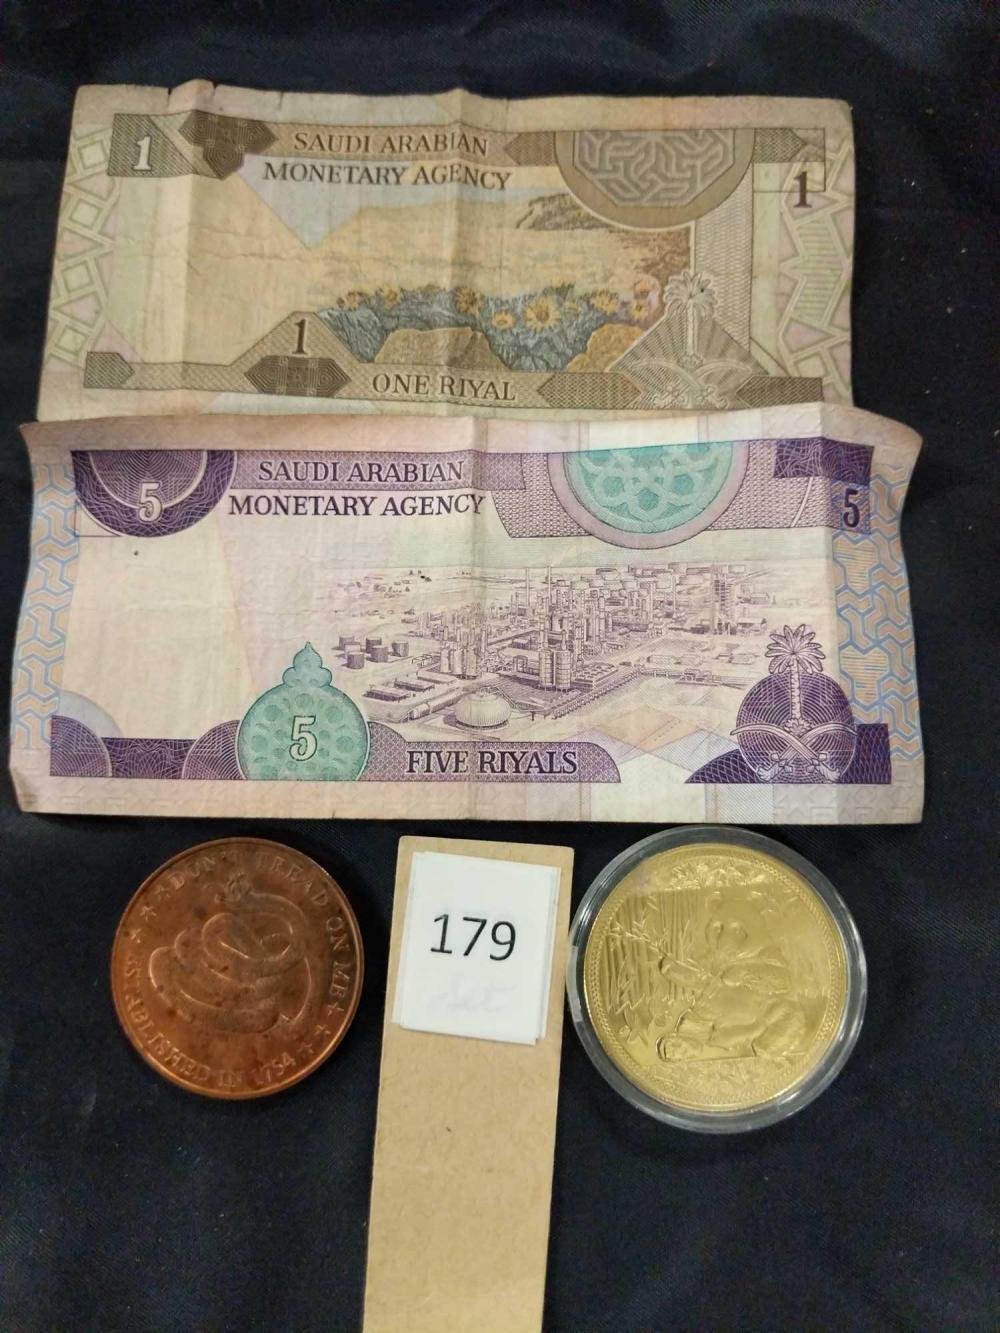 GOLD TONE PANDA ROUND, 1 AVDP OZ. .999 COPPER ROUND & SAUDI ARABIAN PAPER BILLS - 4 ITEMS